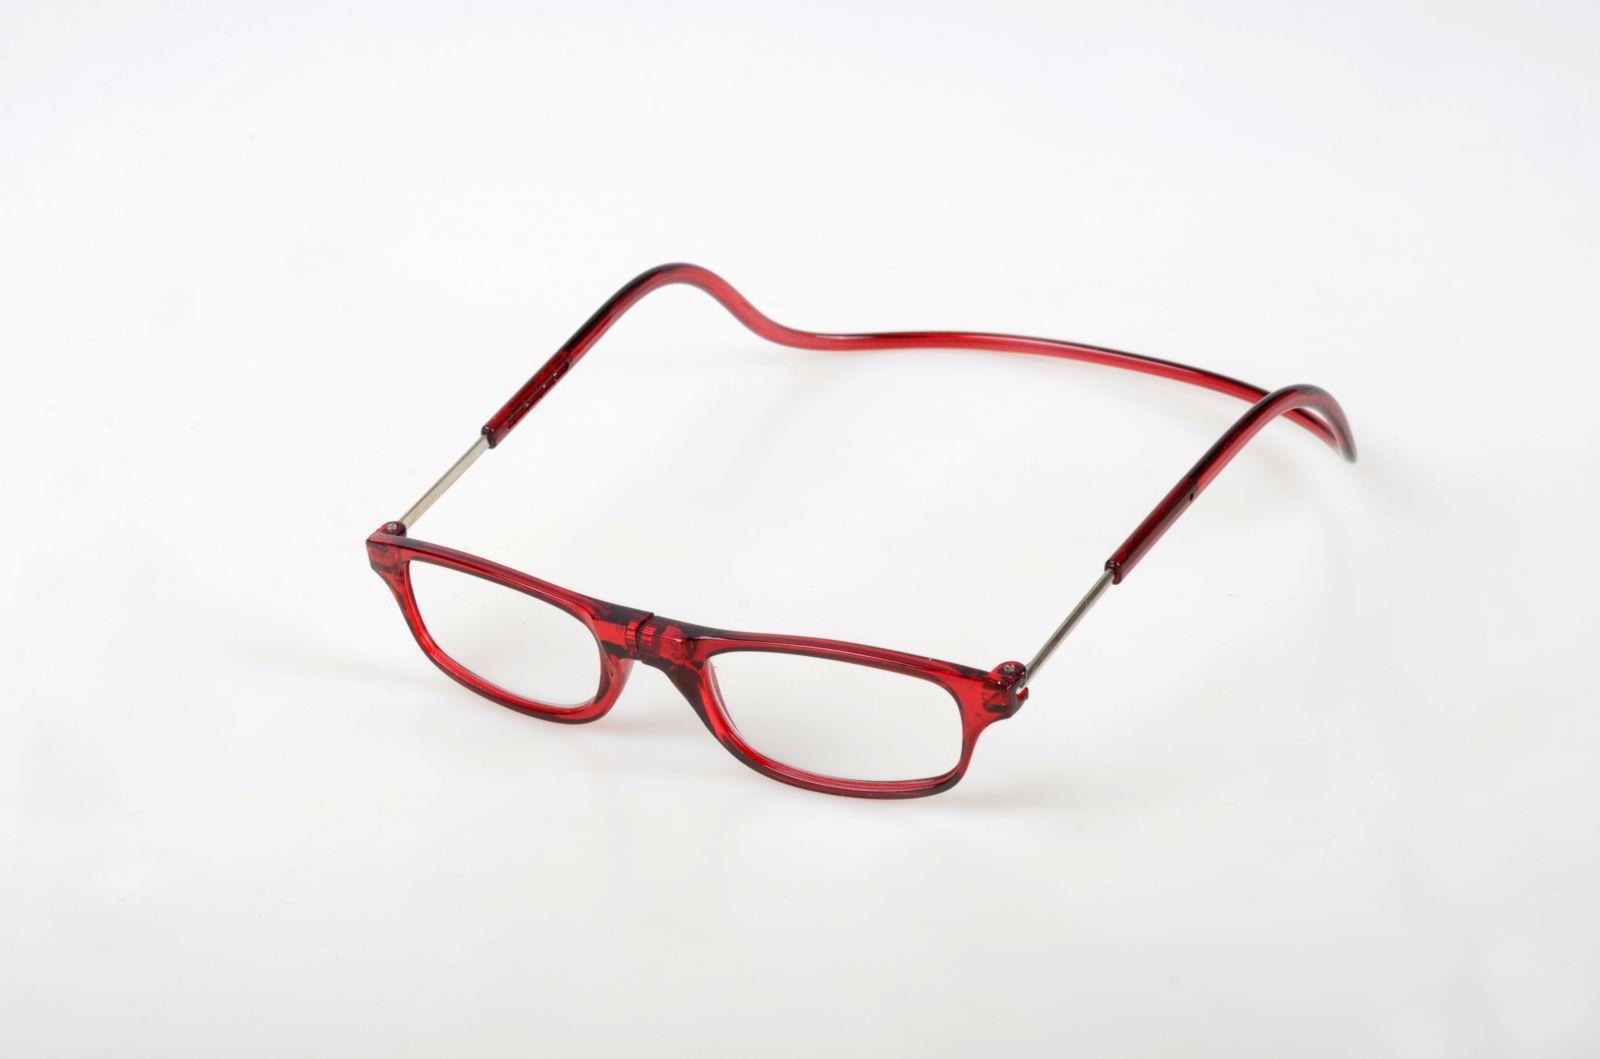 Dioptrické brýle na čtení s magnetem +2,5 - tmavočervené obruby